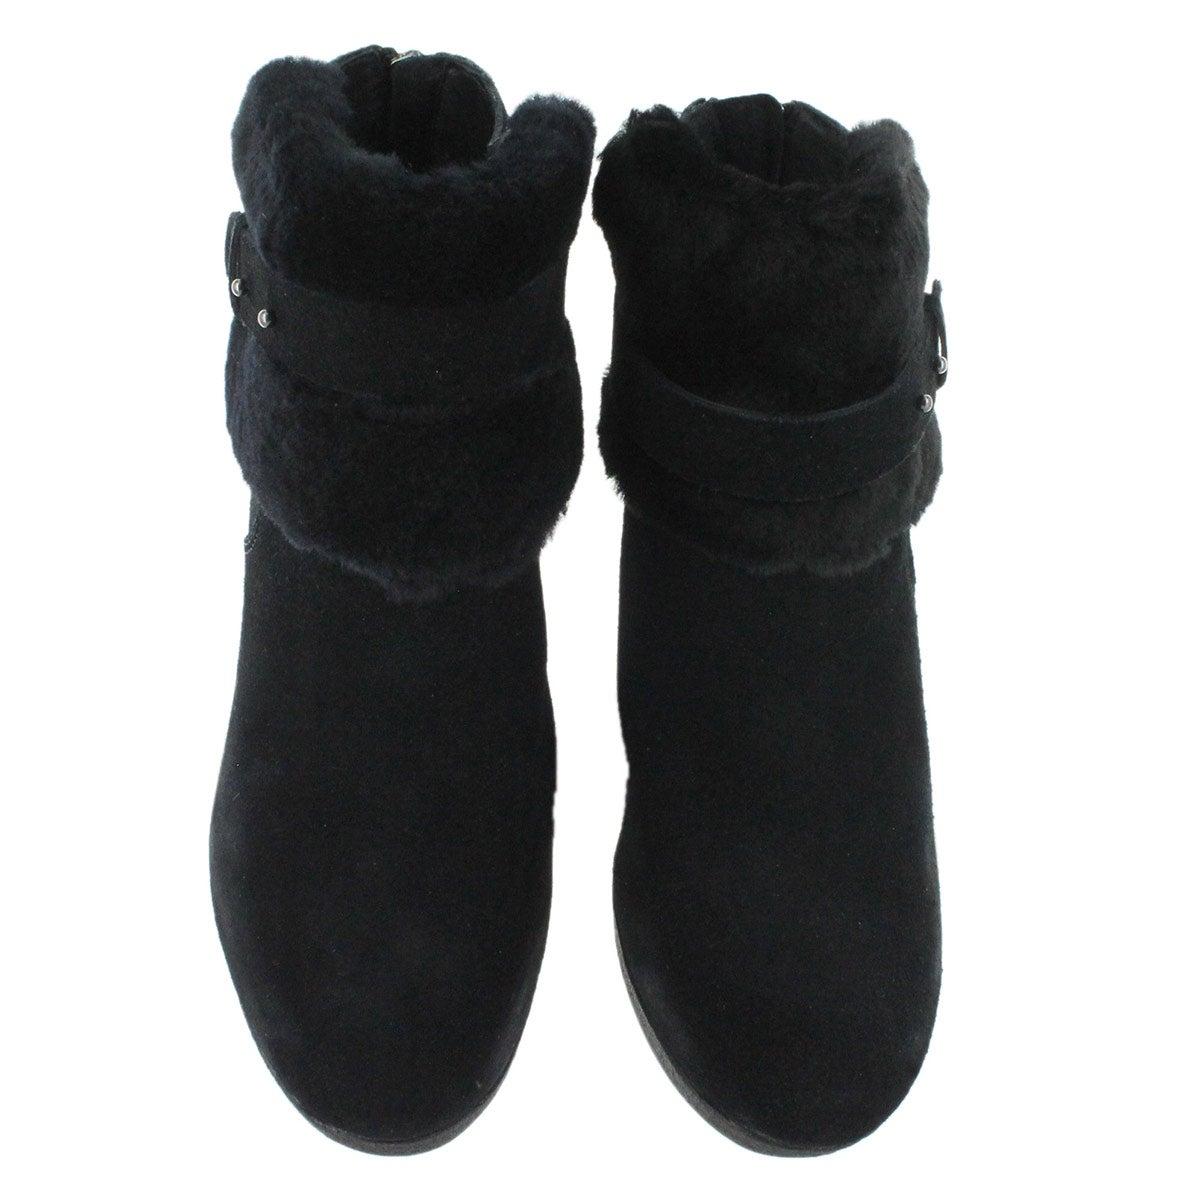 UGG Australia Women's ANTONIA black sheepskin wedge booties 1006143-BLK